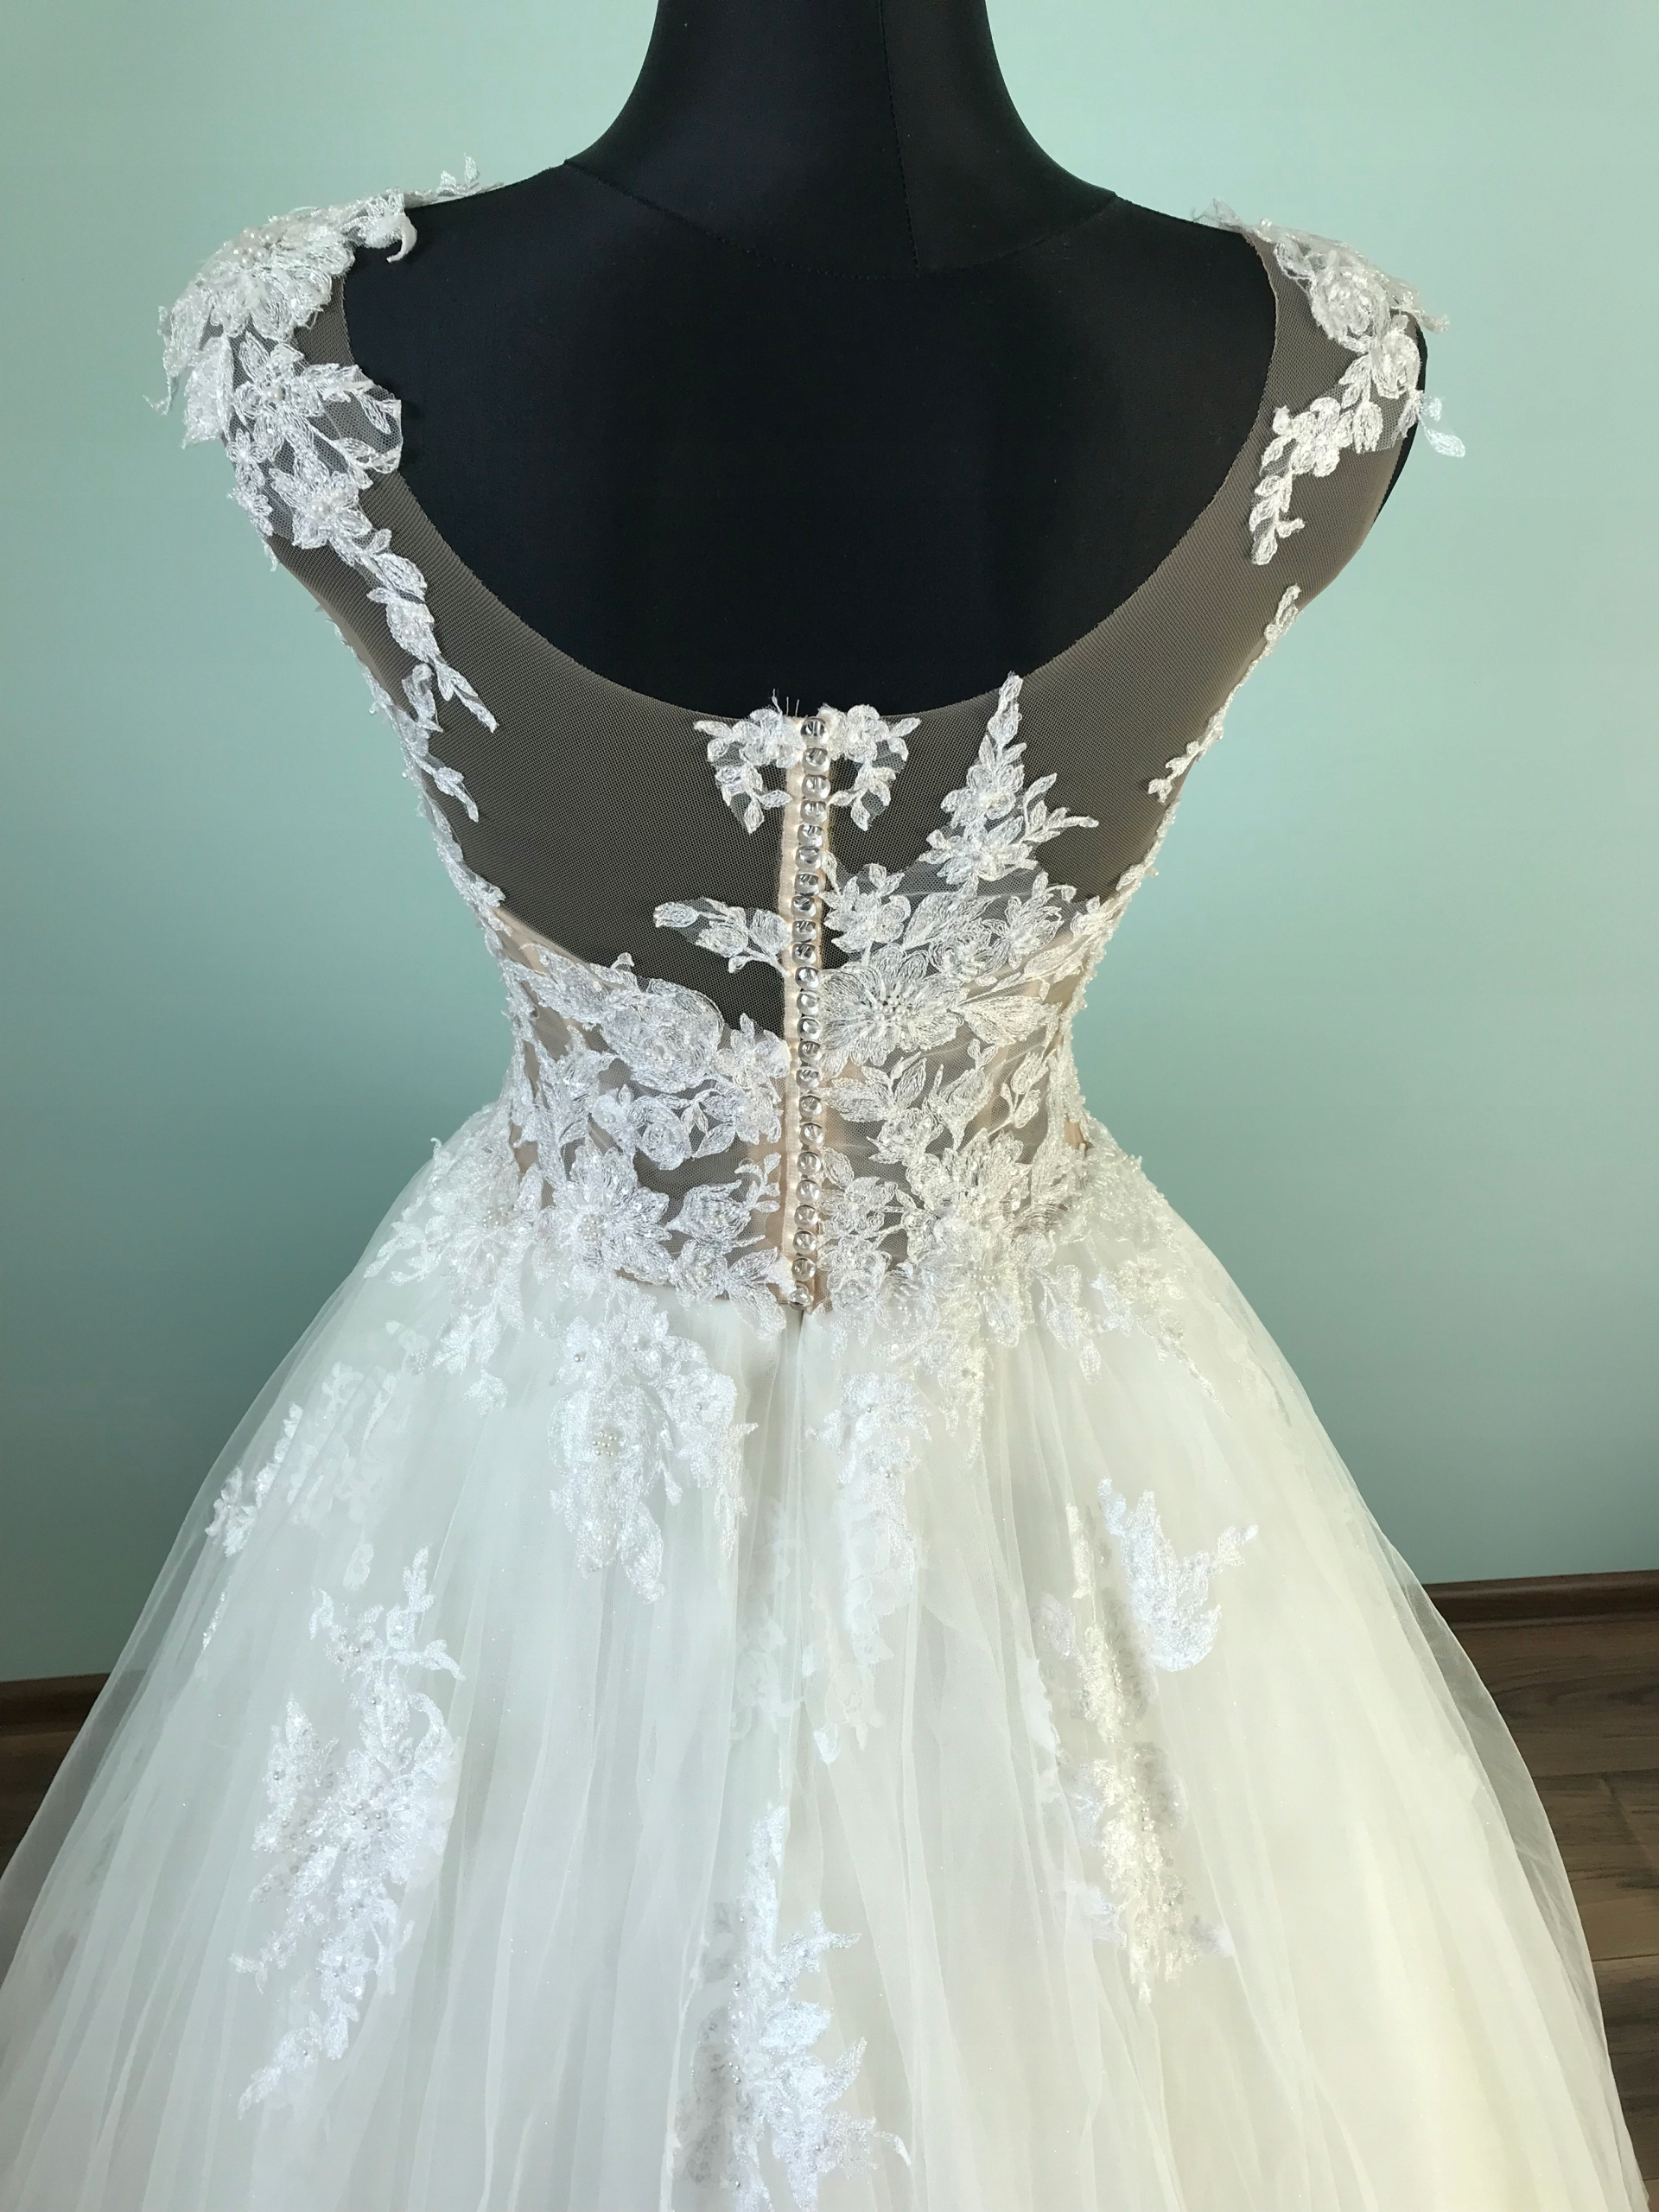 dac15ced28 Suknia ślubna Lamberta 7691679518 Oficjalne Archiwum Allegro